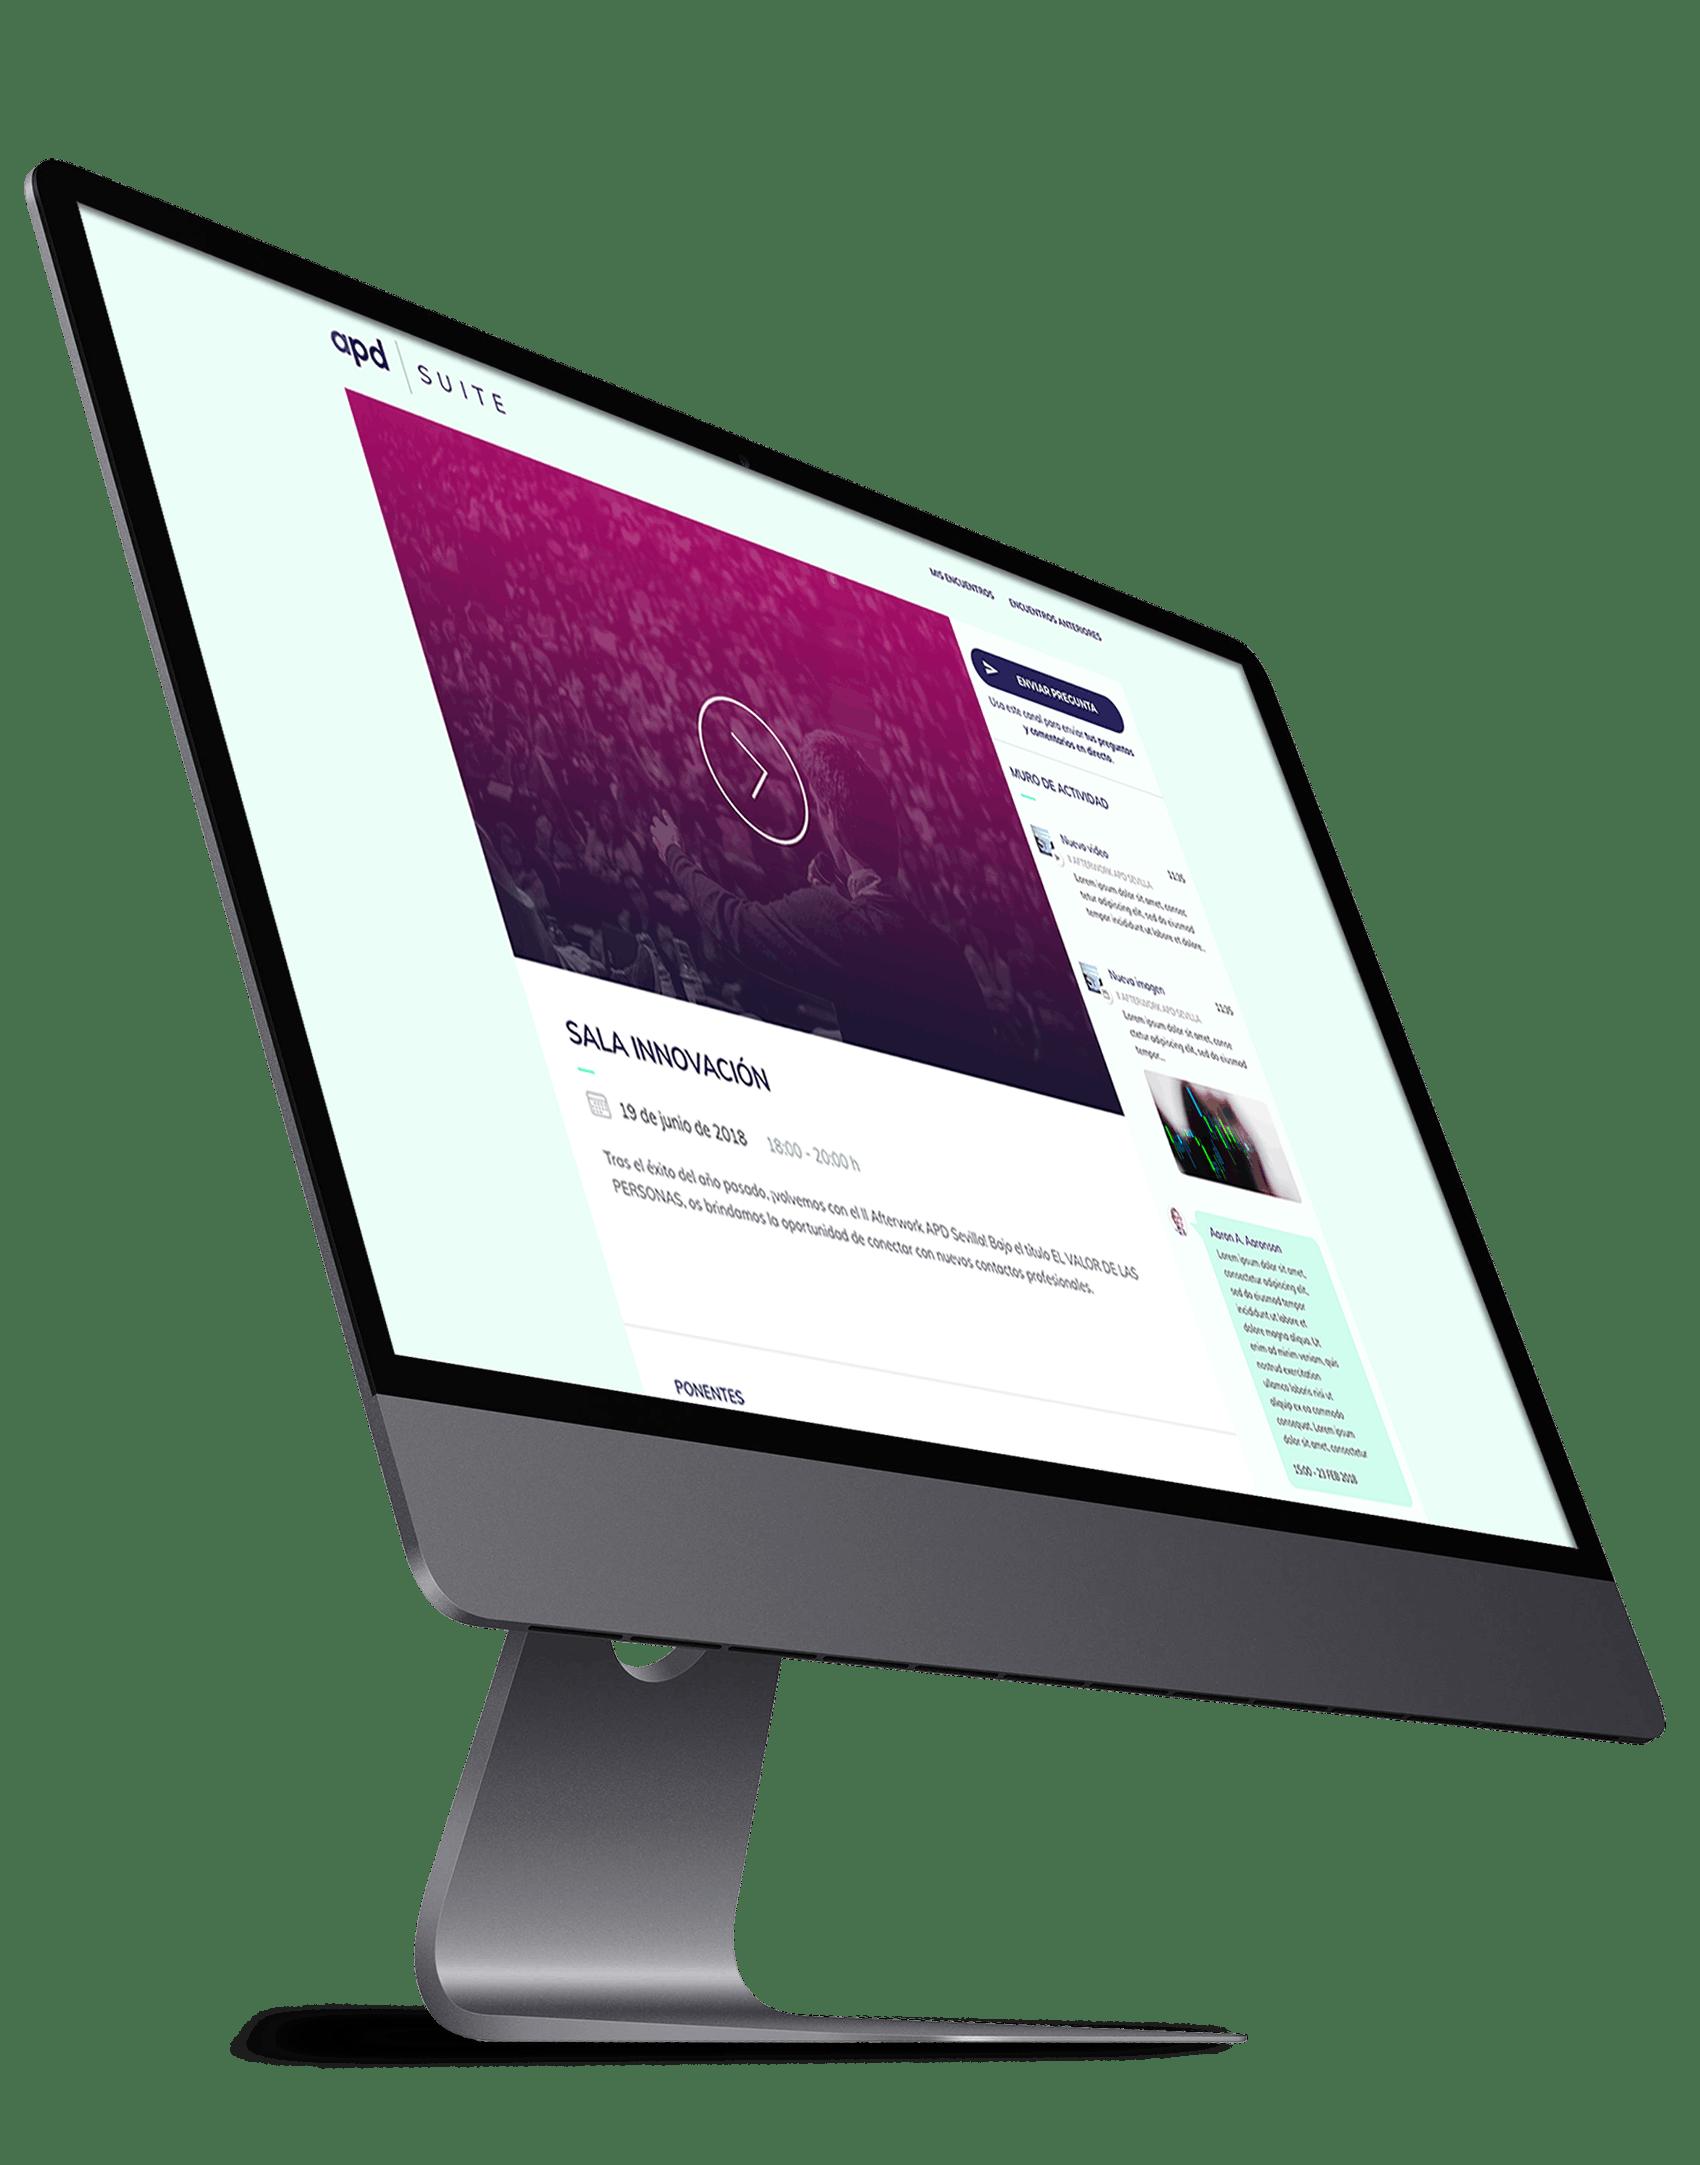 apd_desktop-mockup